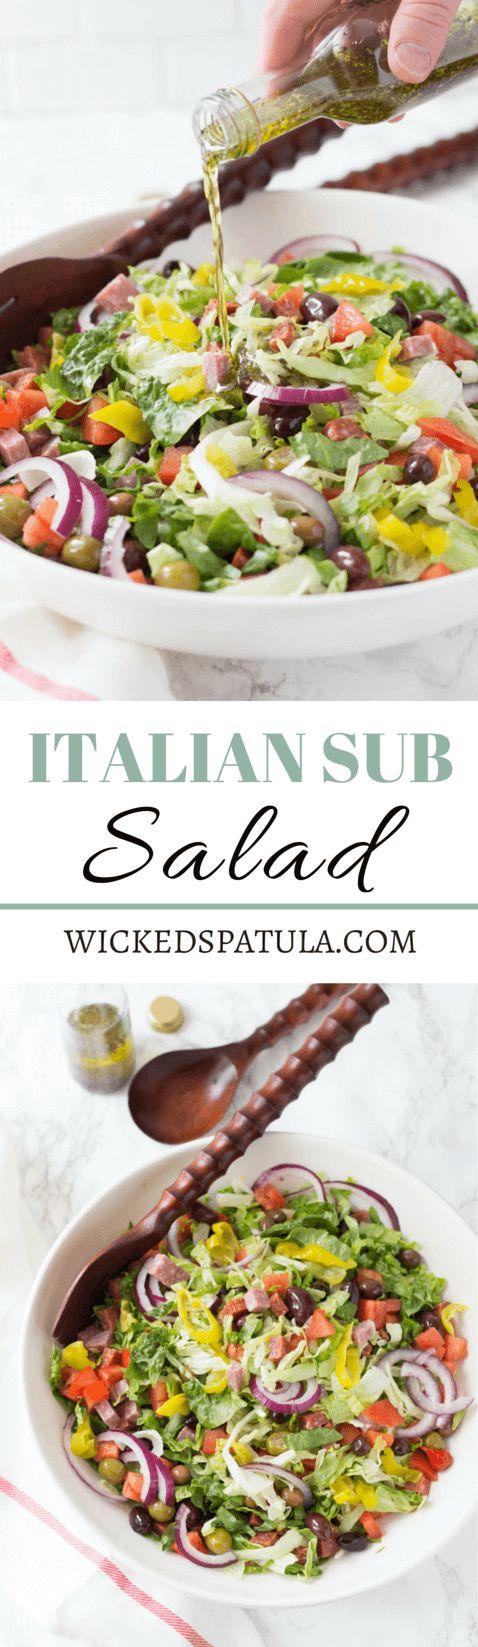 italian sub salad - paleo, gluten free